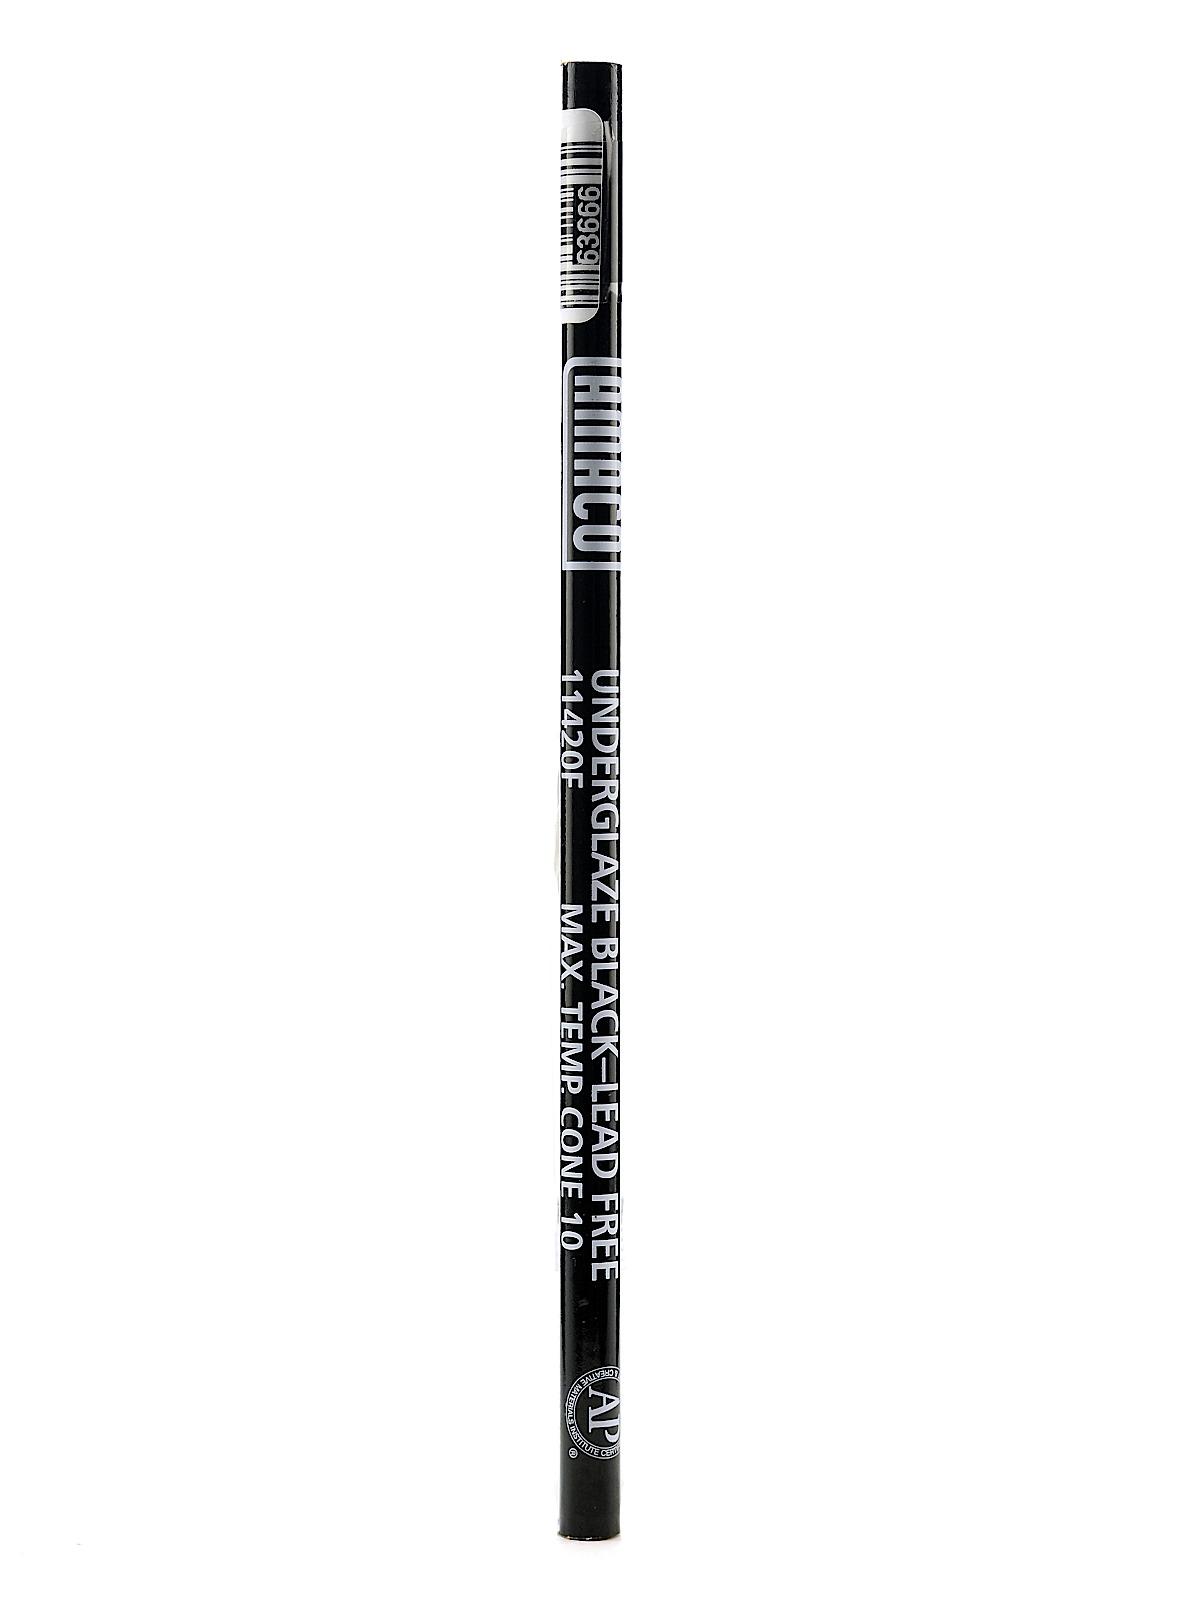 Amaco Underglaze Pencils Misterart Com